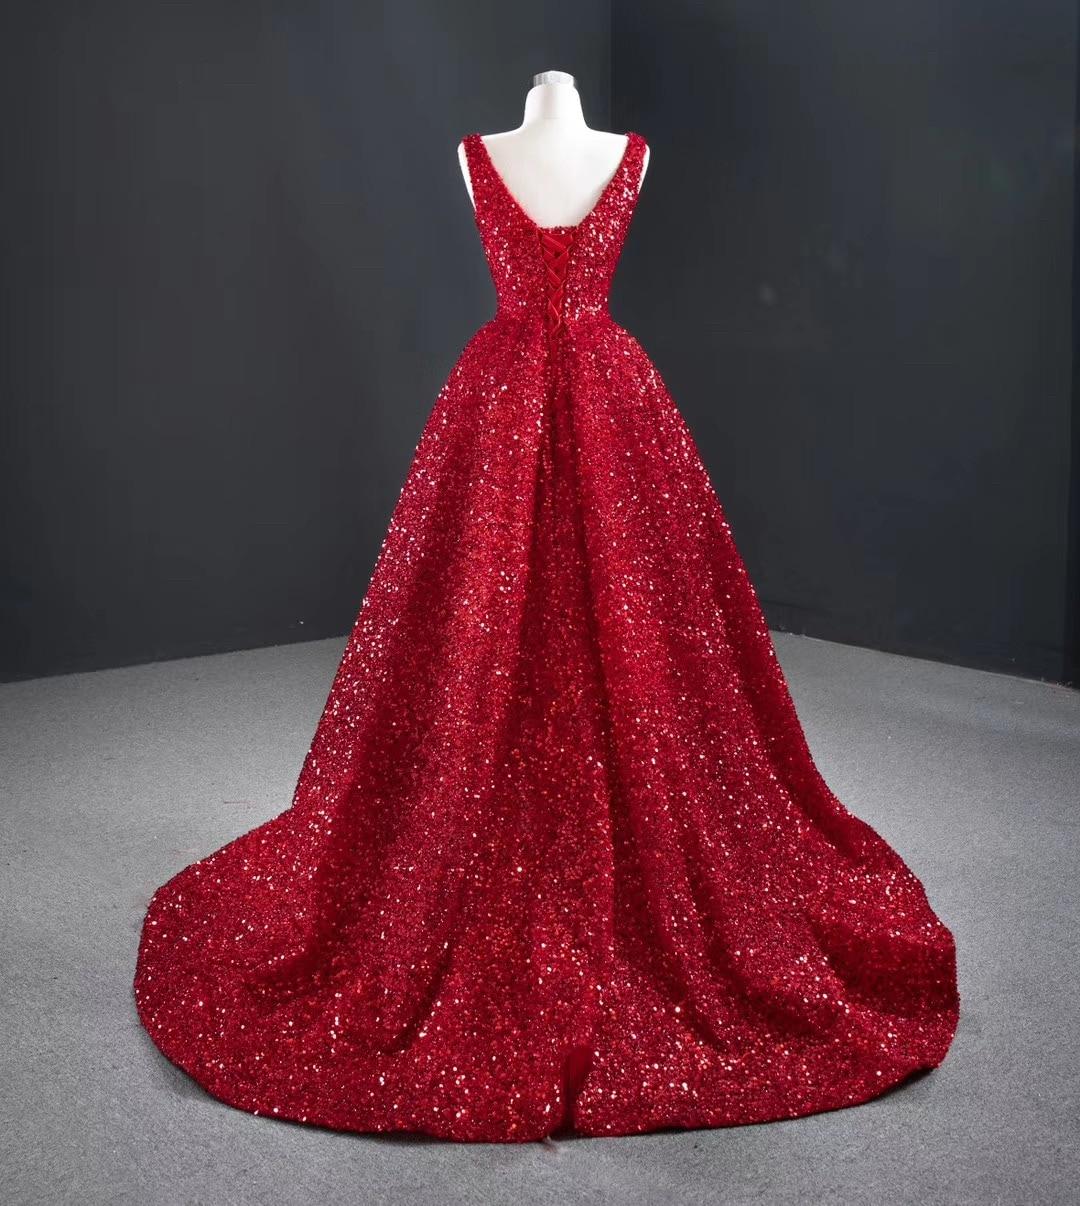 Elegant Red Evening Dress Fashionable Women sequin Dresses Short in Front Long in Back Prom Dress